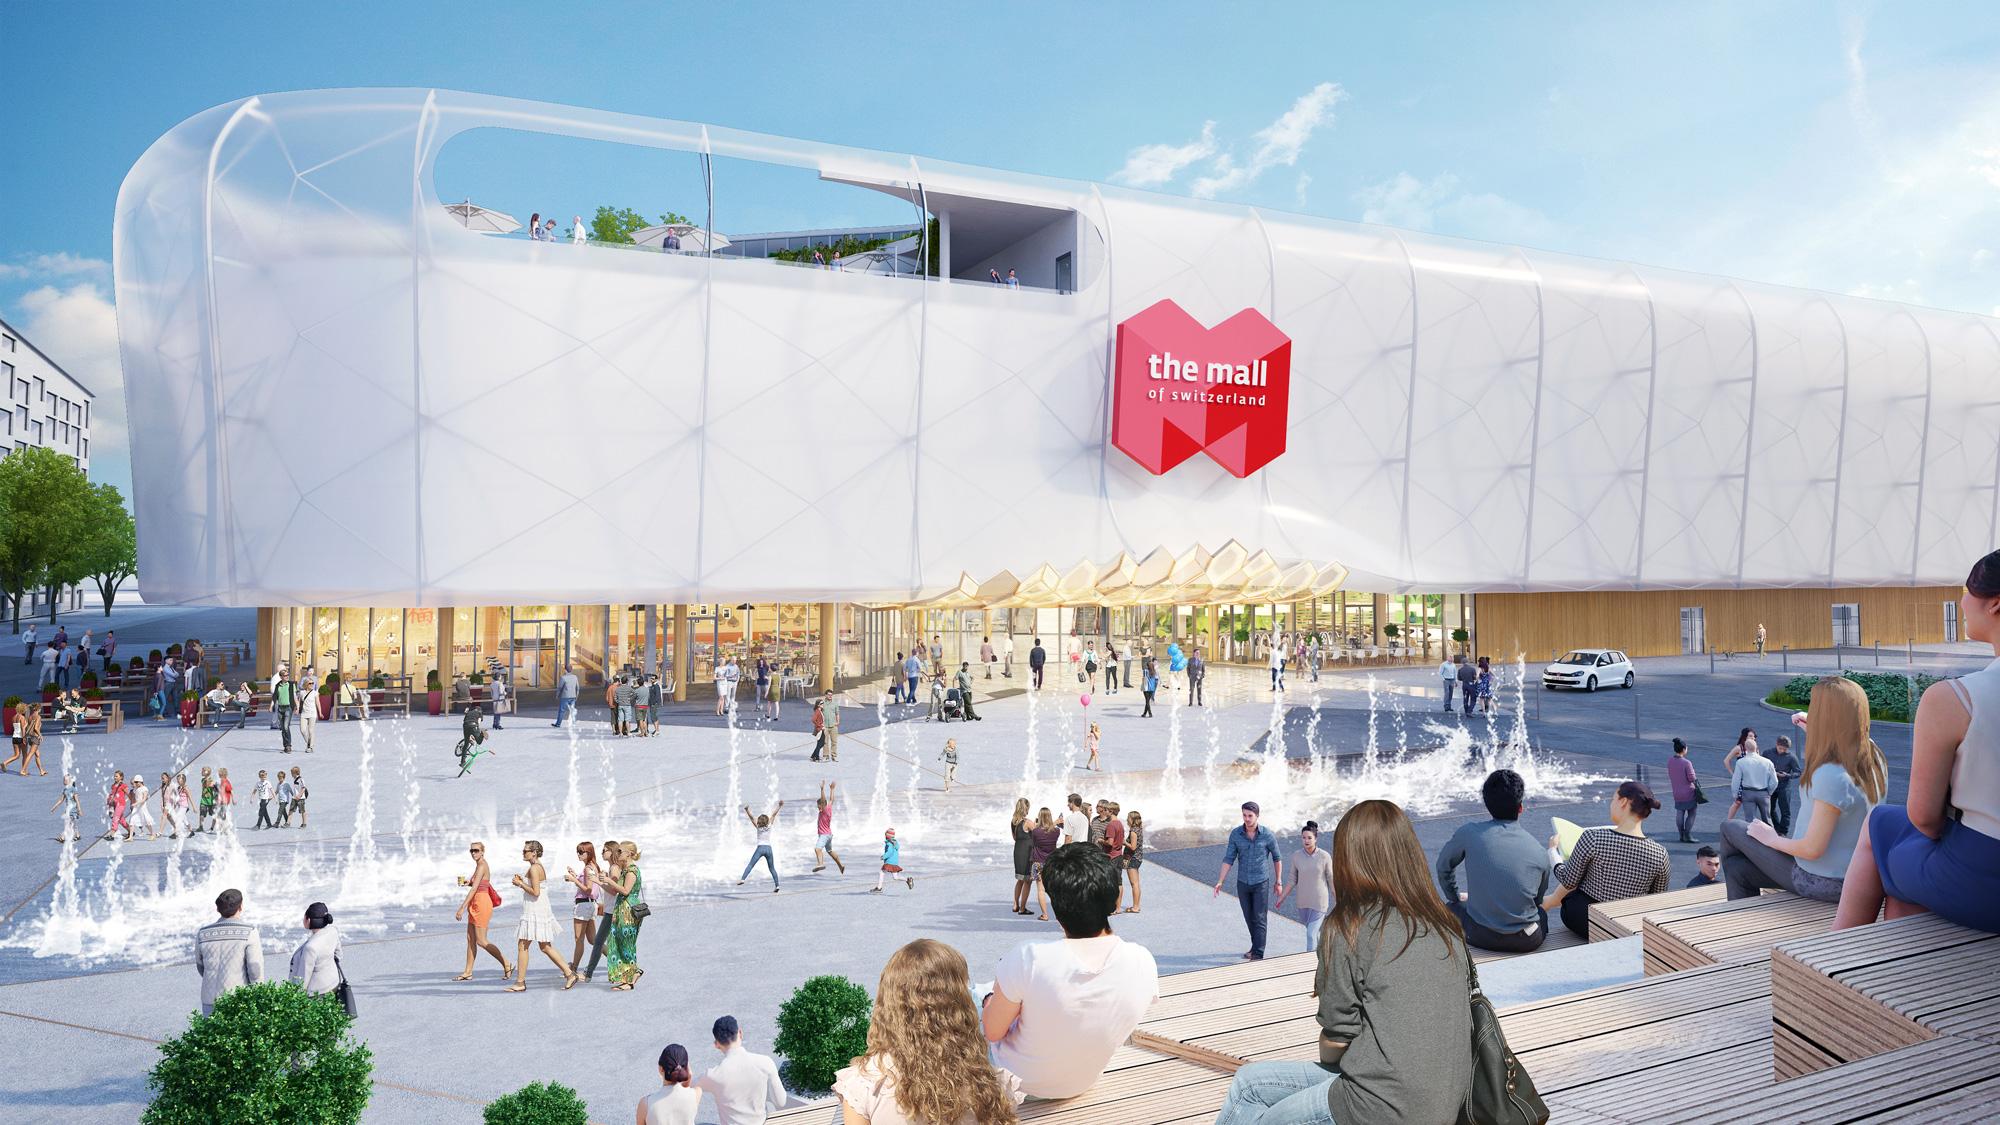 mall-of-switzerland-featured